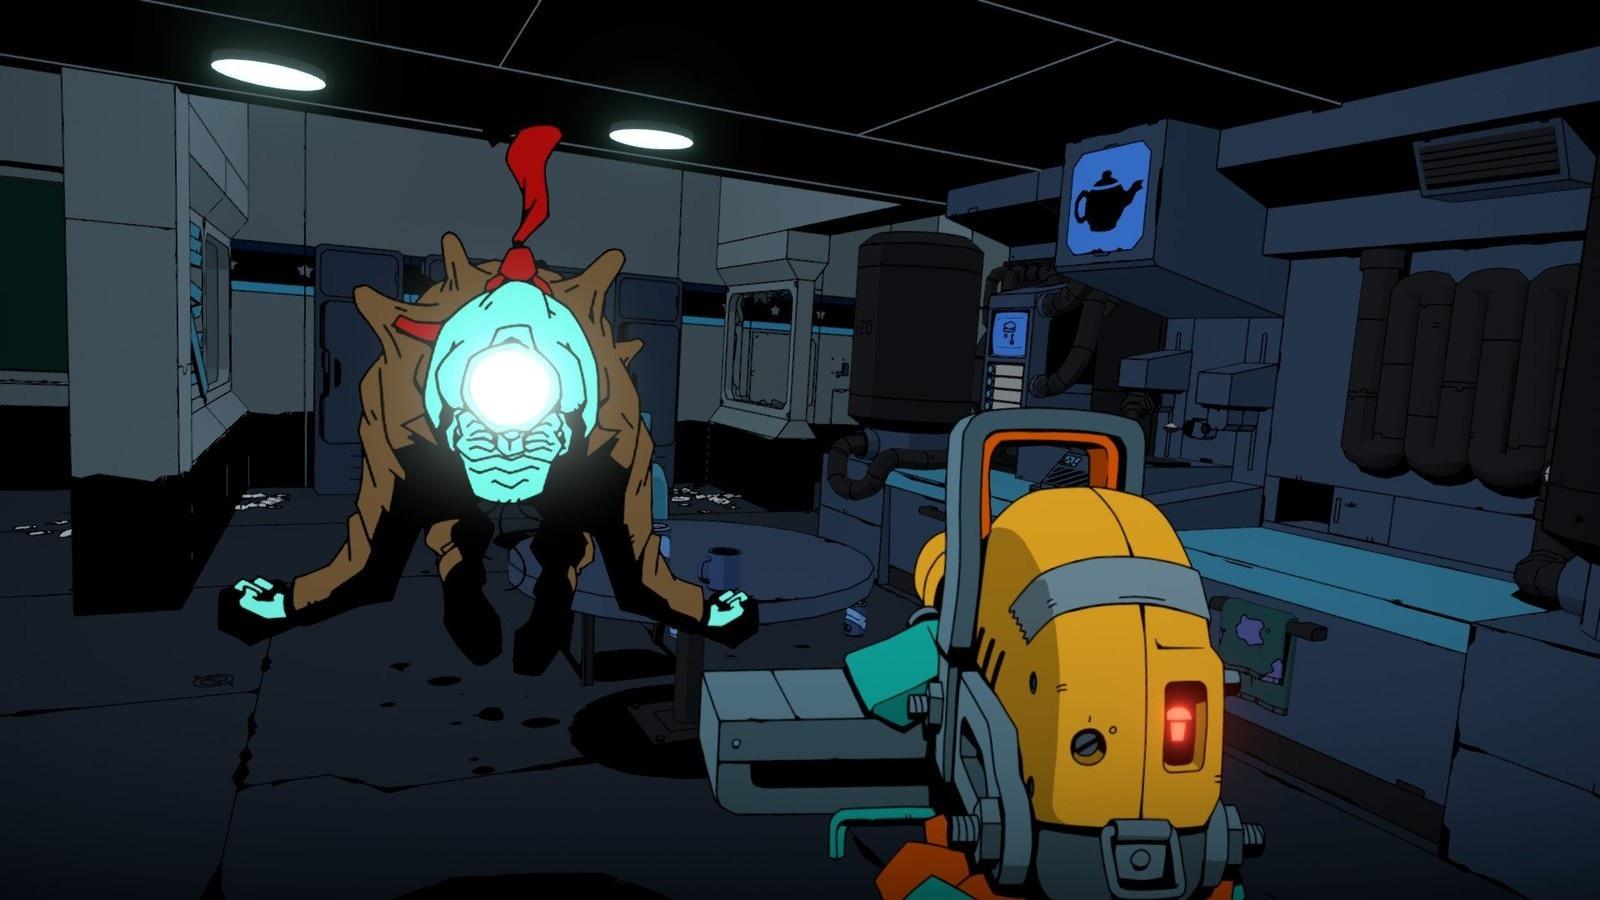 Void Bastards | The 10 Best Video Games of 2019 | Gammicks